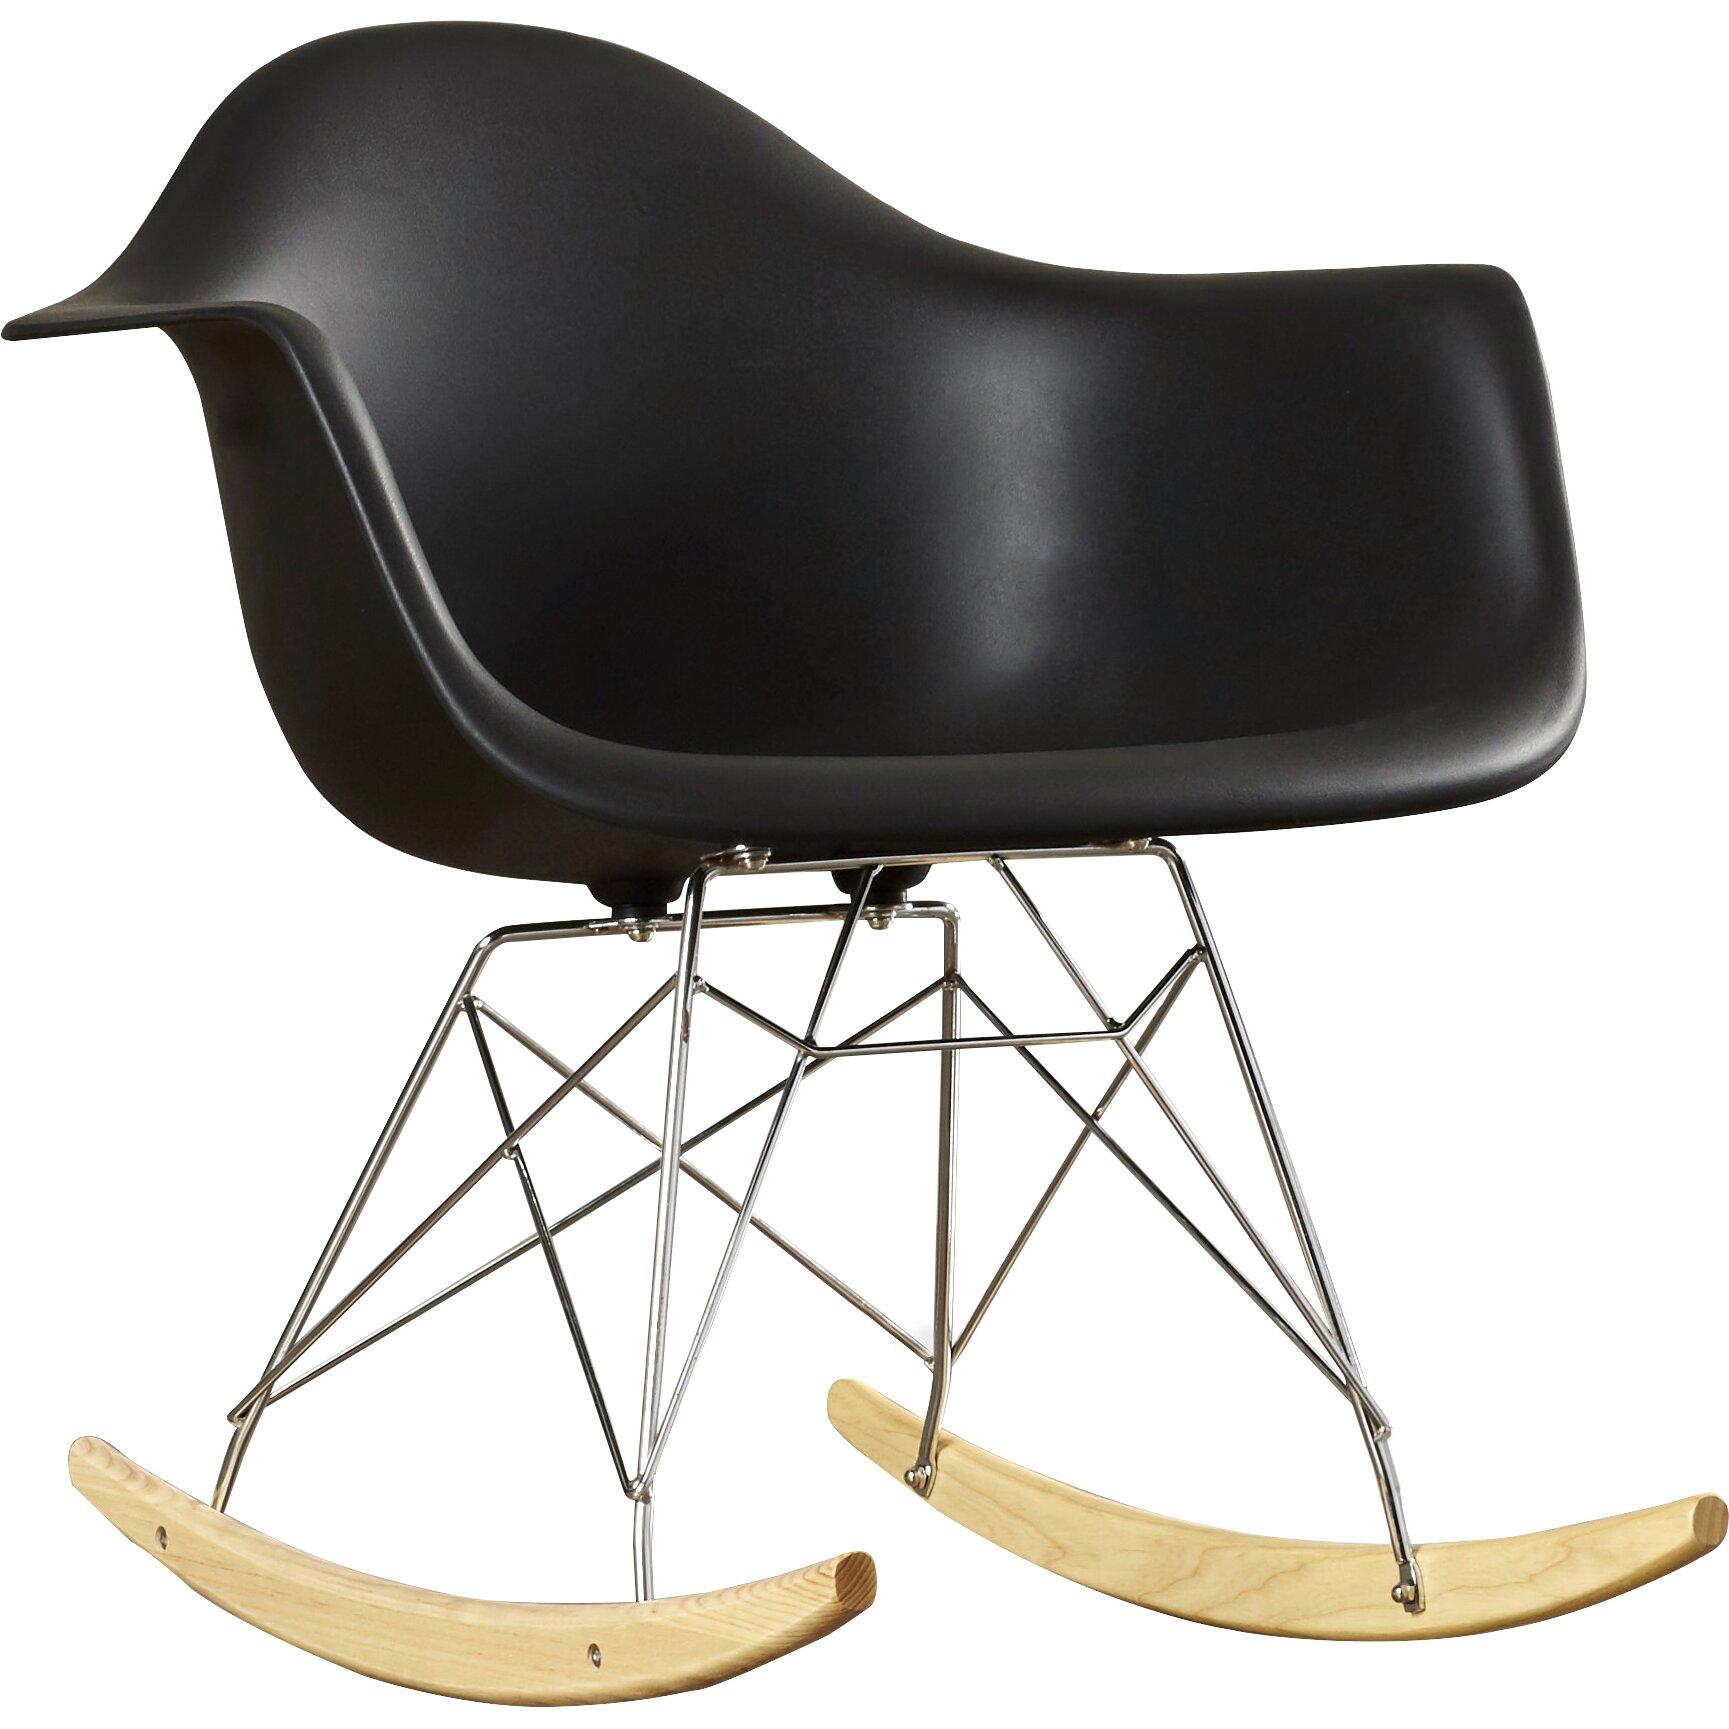 Langley Rocker Gaming Chair L0342 Swivel Rocker Recliner